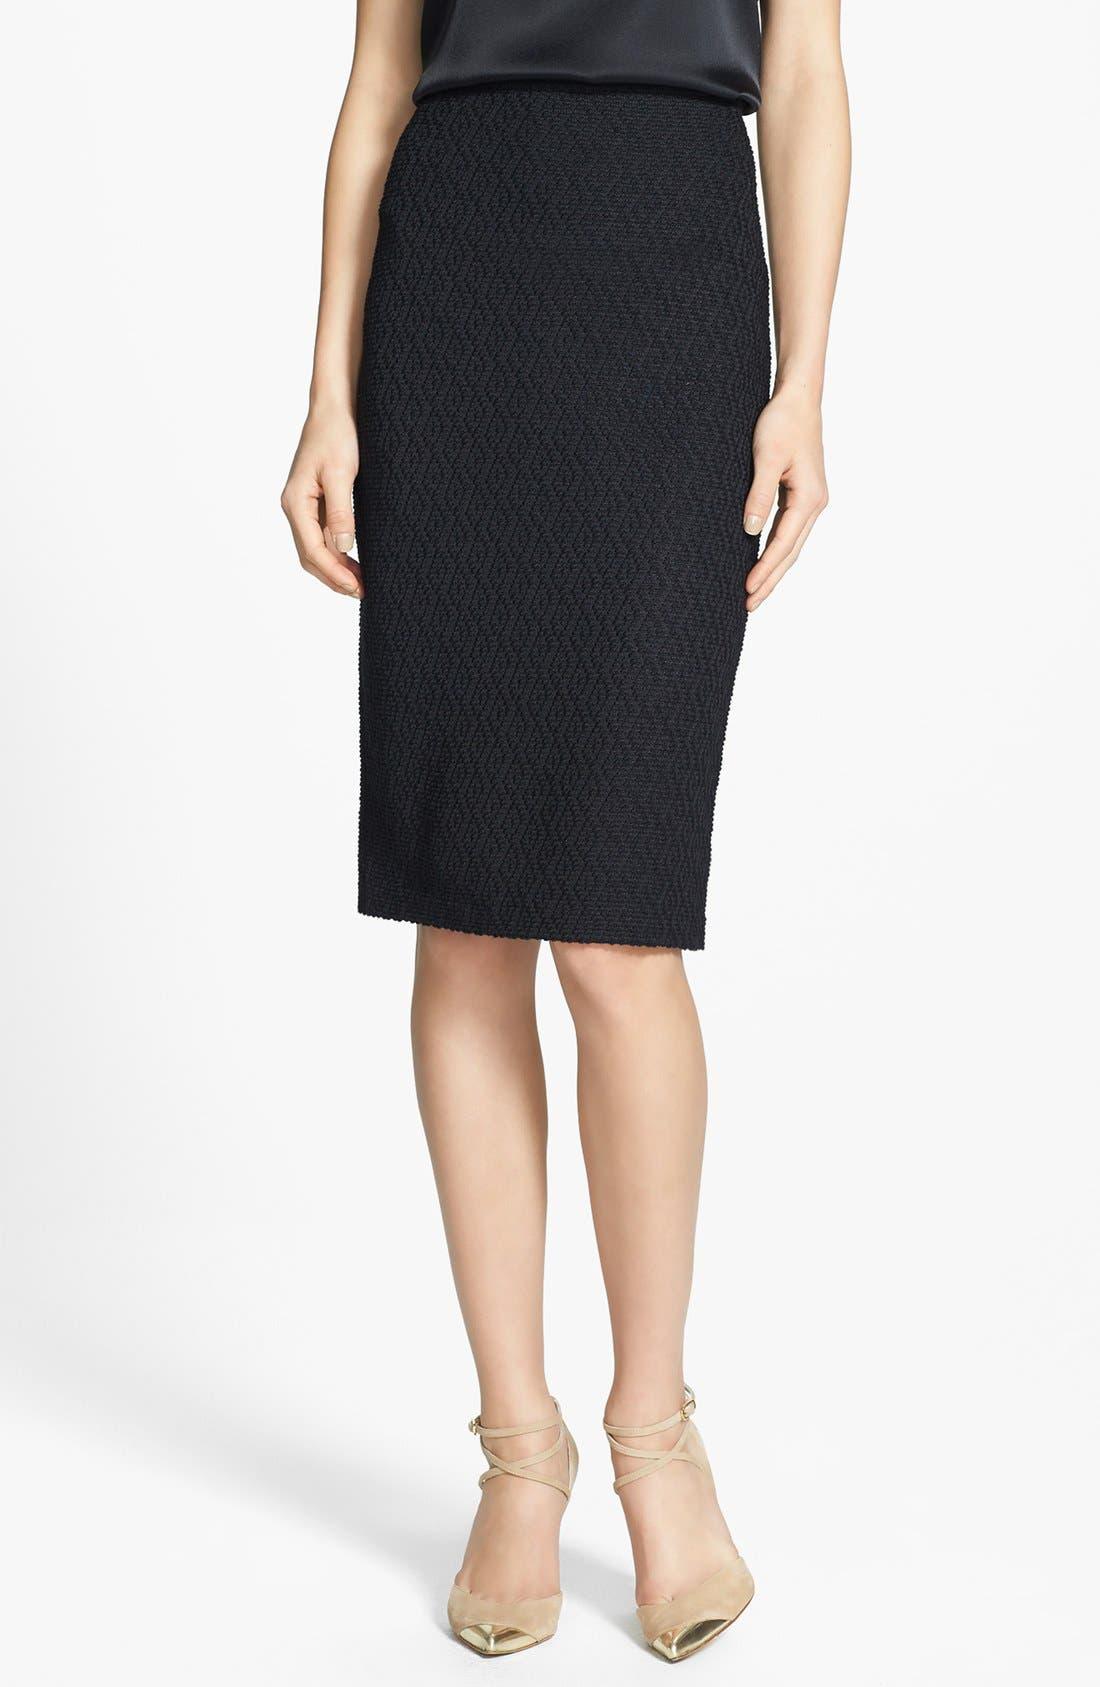 Alternate Image 1 Selected - St. John Collection Diamond Dash Knit Skirt